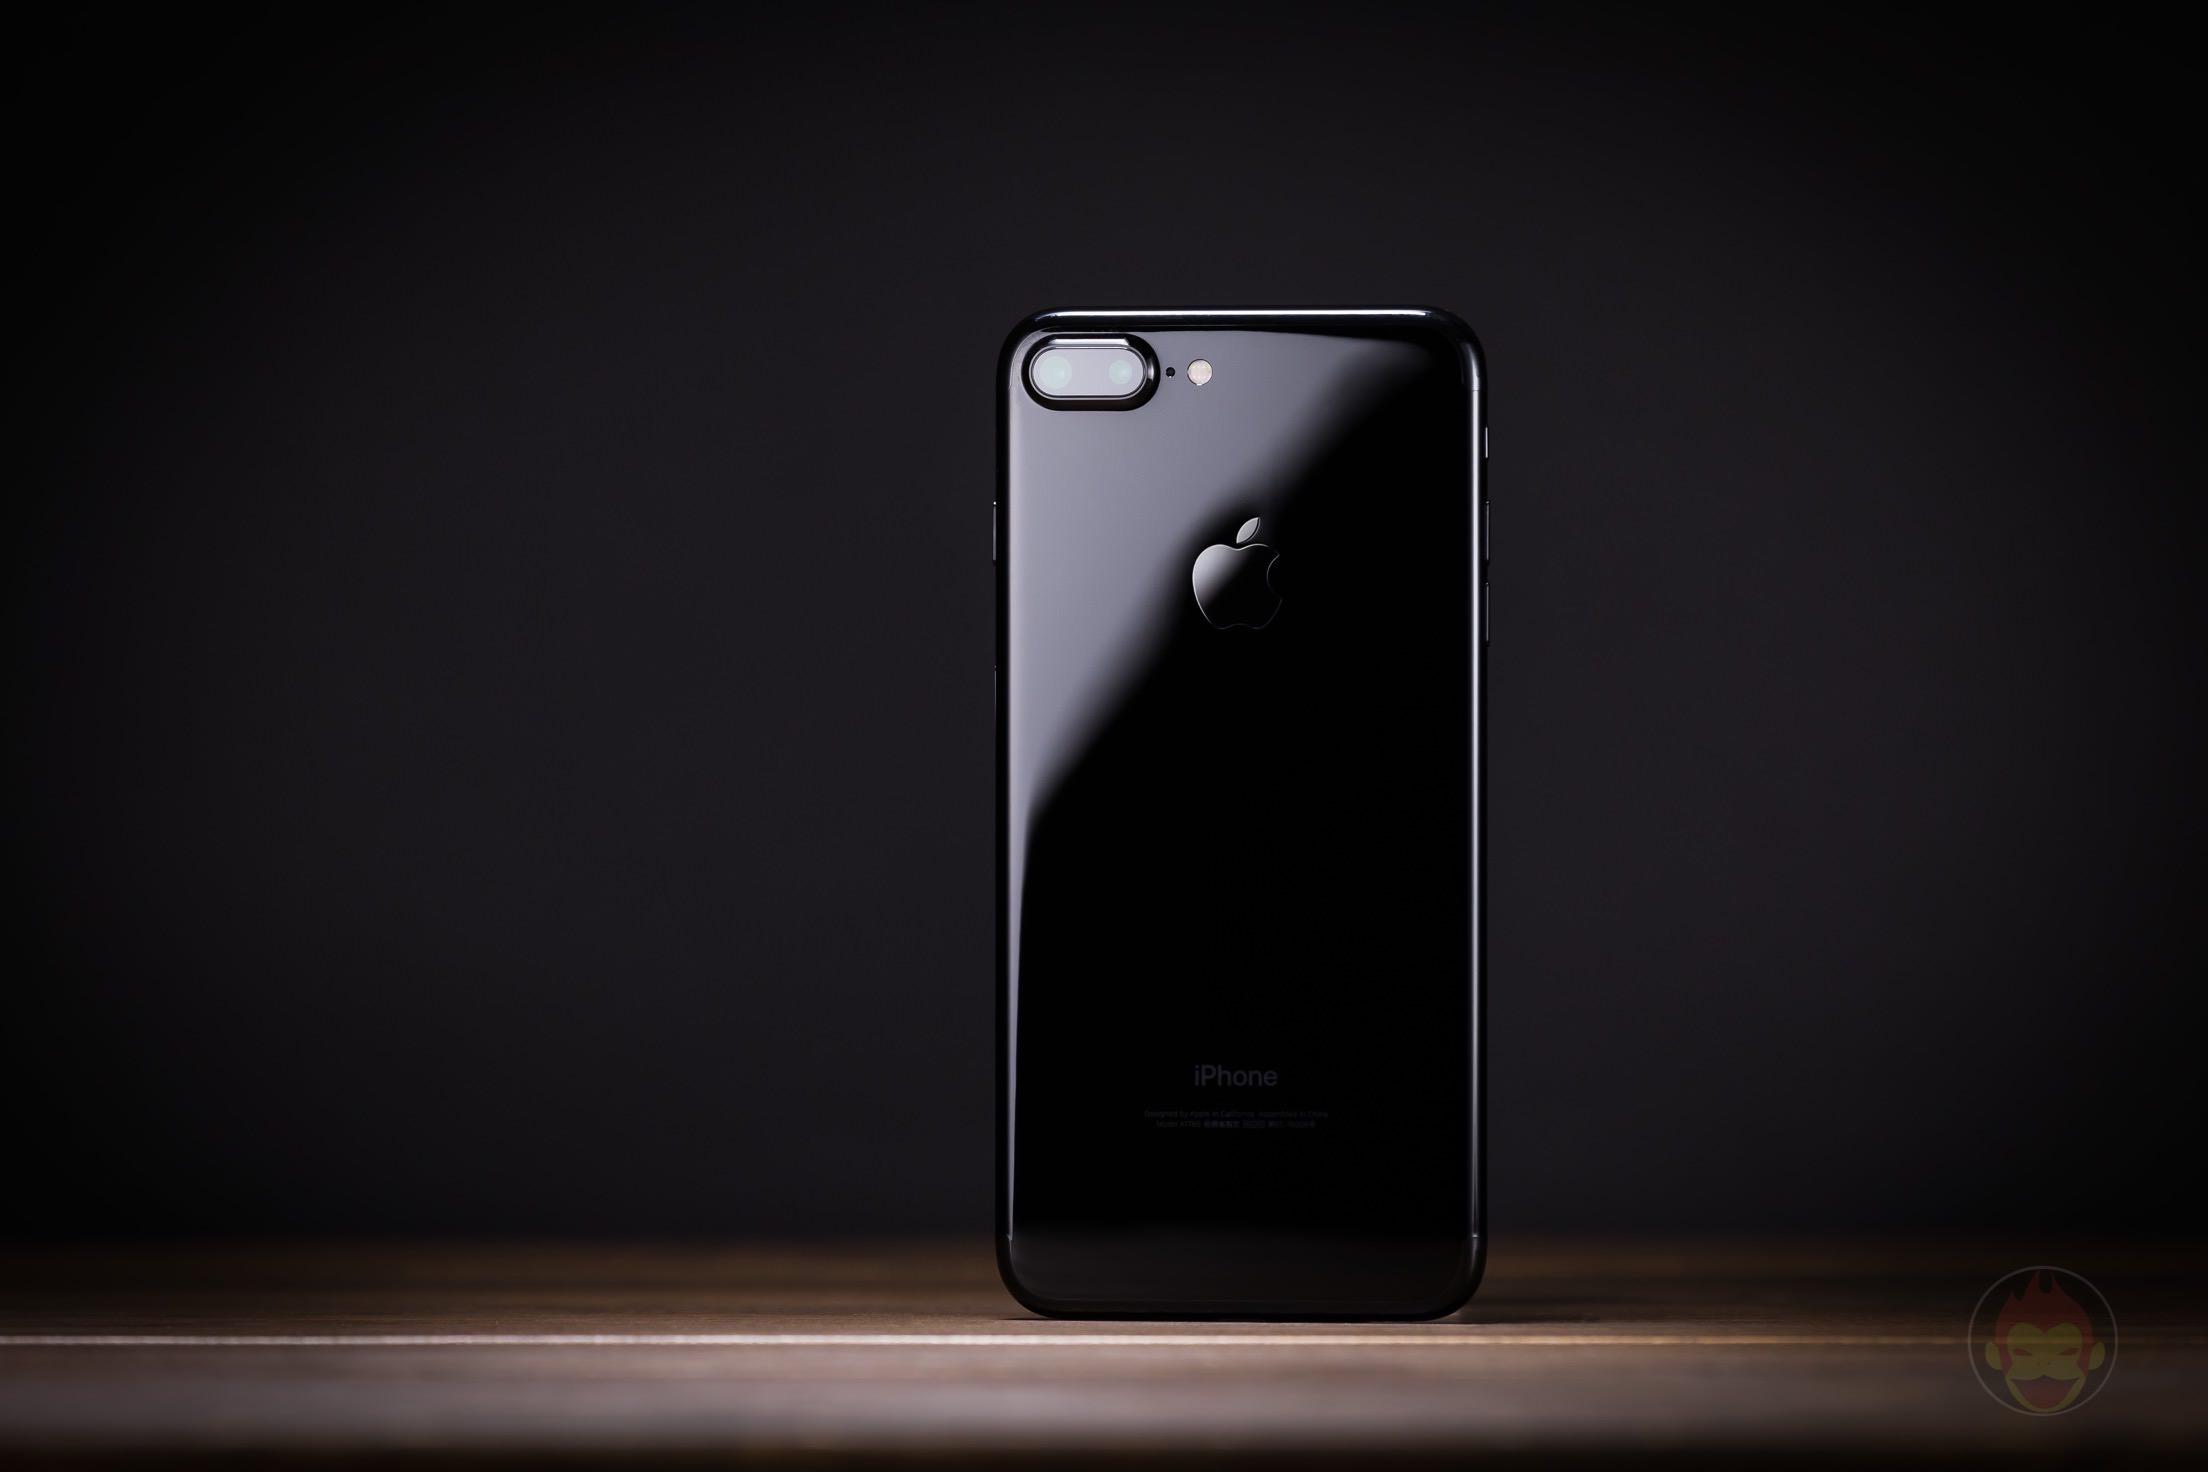 iPhone-7-Plus-Jet-Black-Design-review-05.jpg